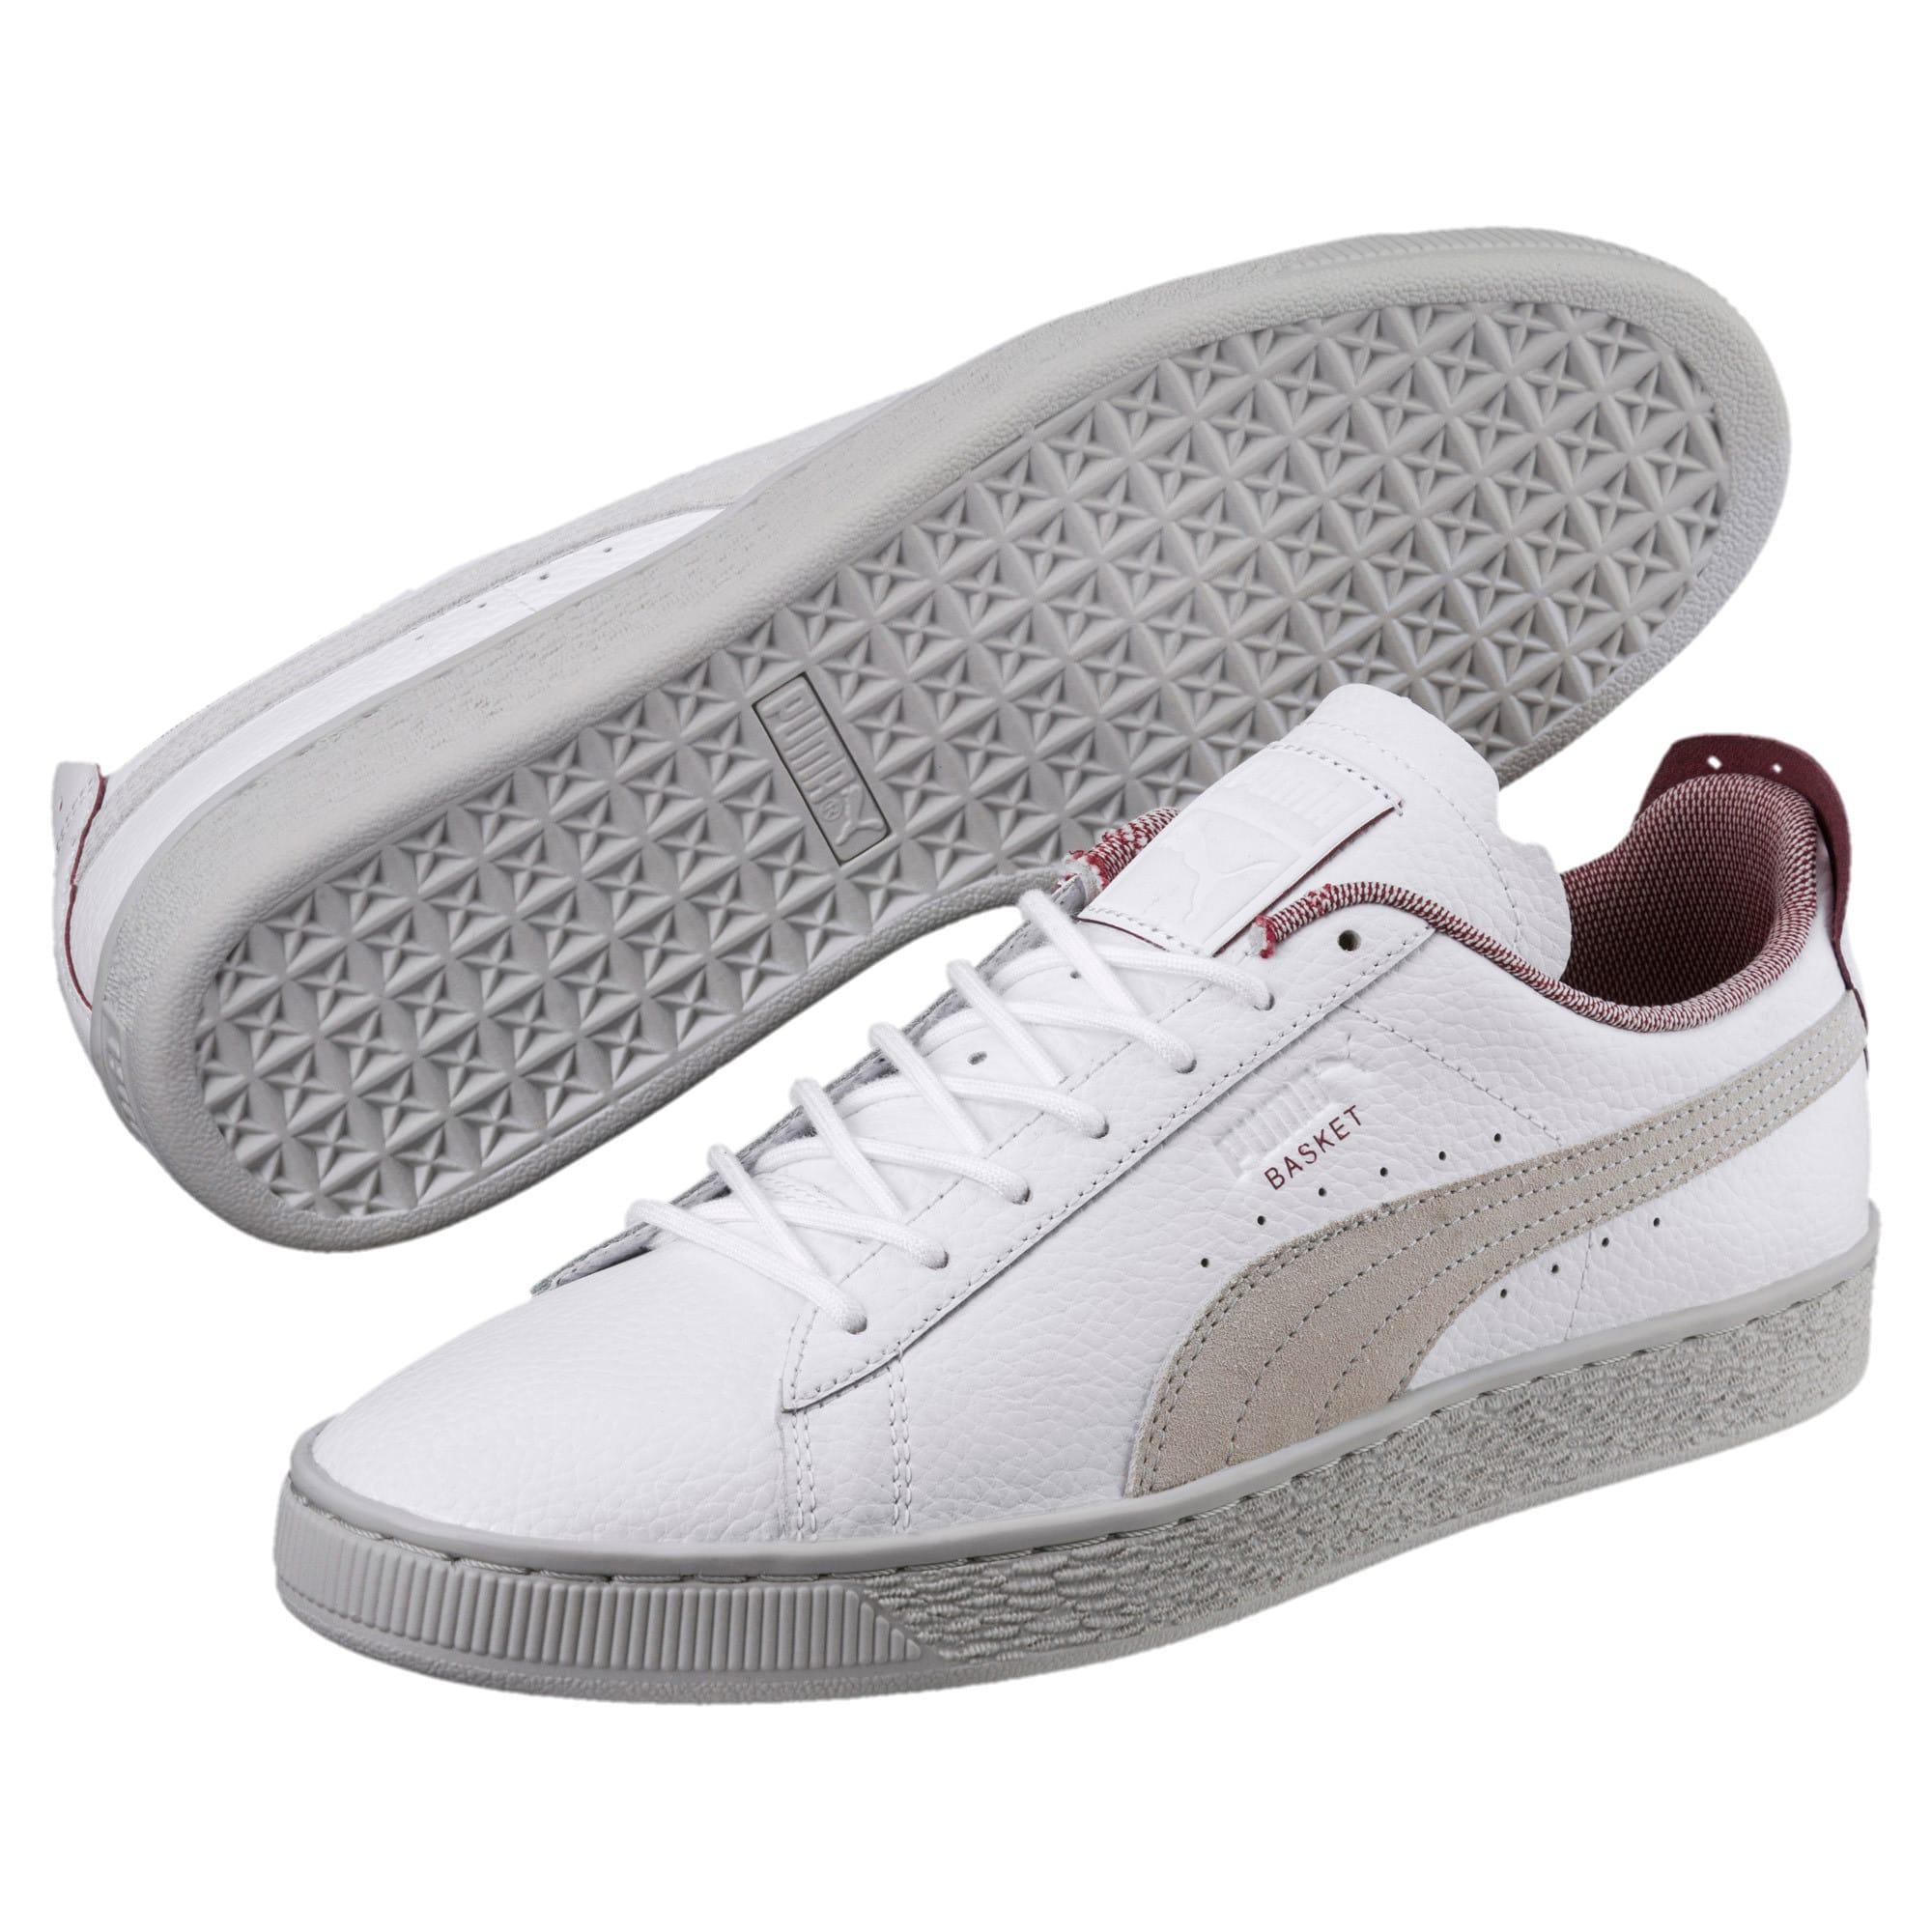 Thumbnail 2 of Scuderia Ferrari Basket Sneakers, Puma White-Glacier Gray, medium